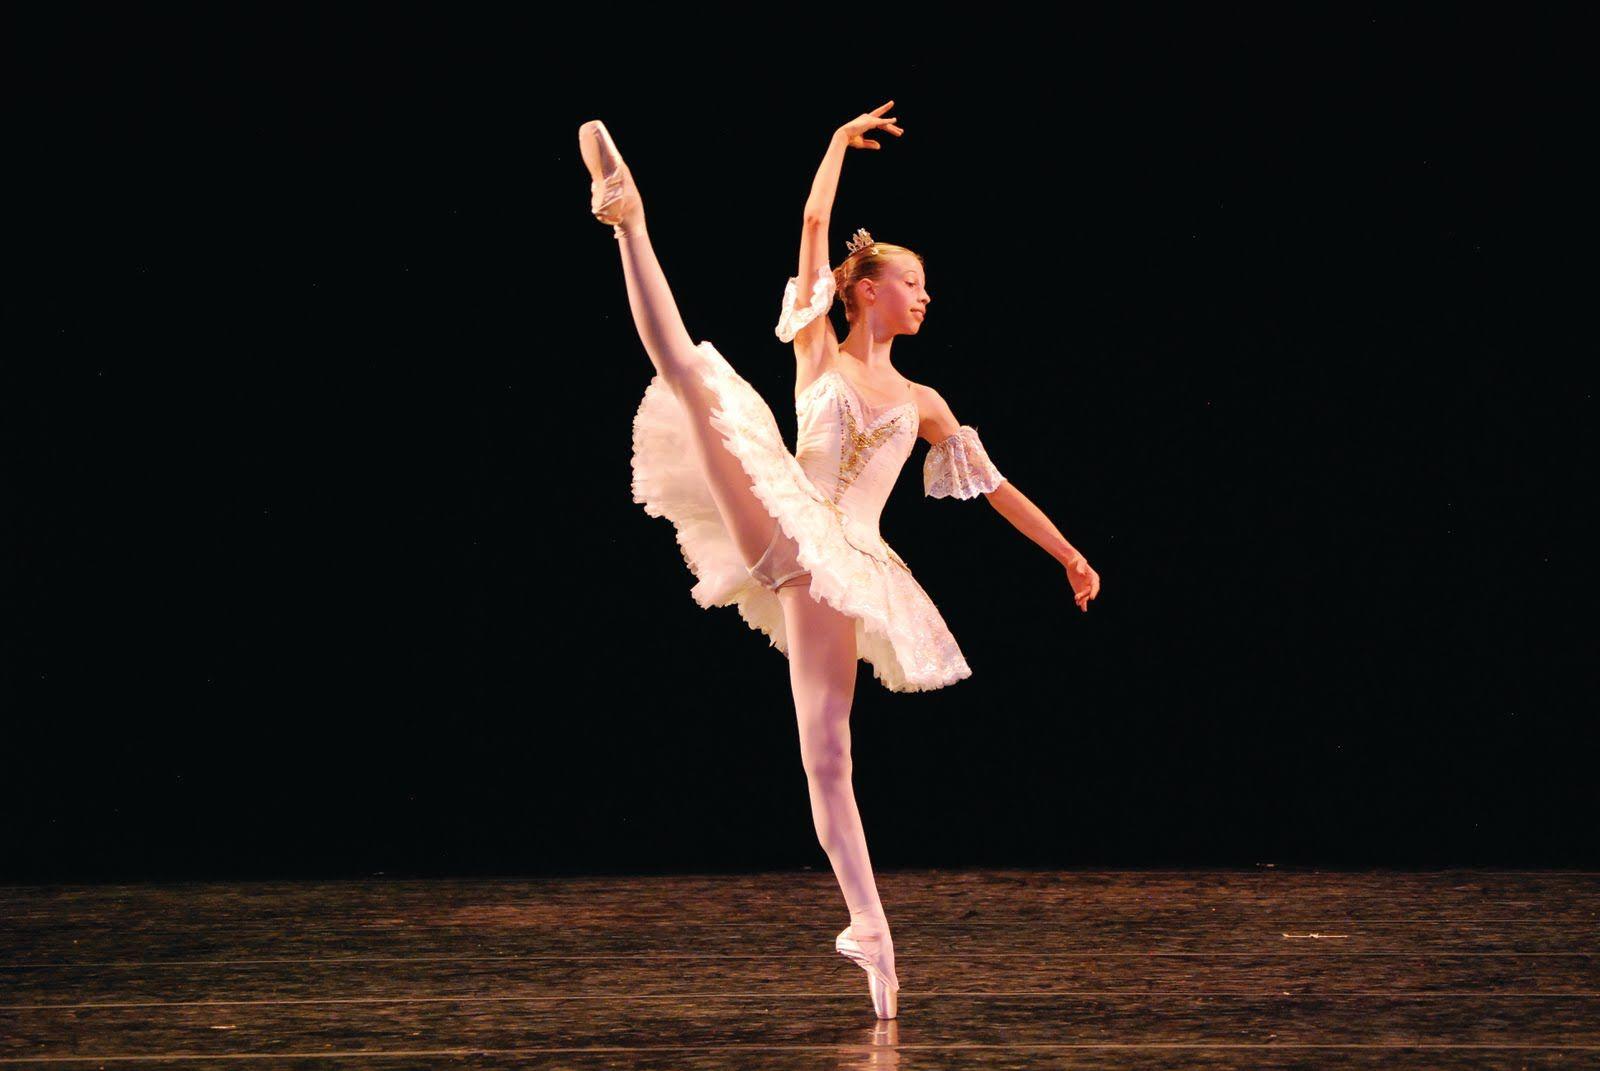 Tulsa Ballet Center For Dance Education Students Sweep Regional Competition Ballet Dancer Feet Dancers Feet Ballet Dancers